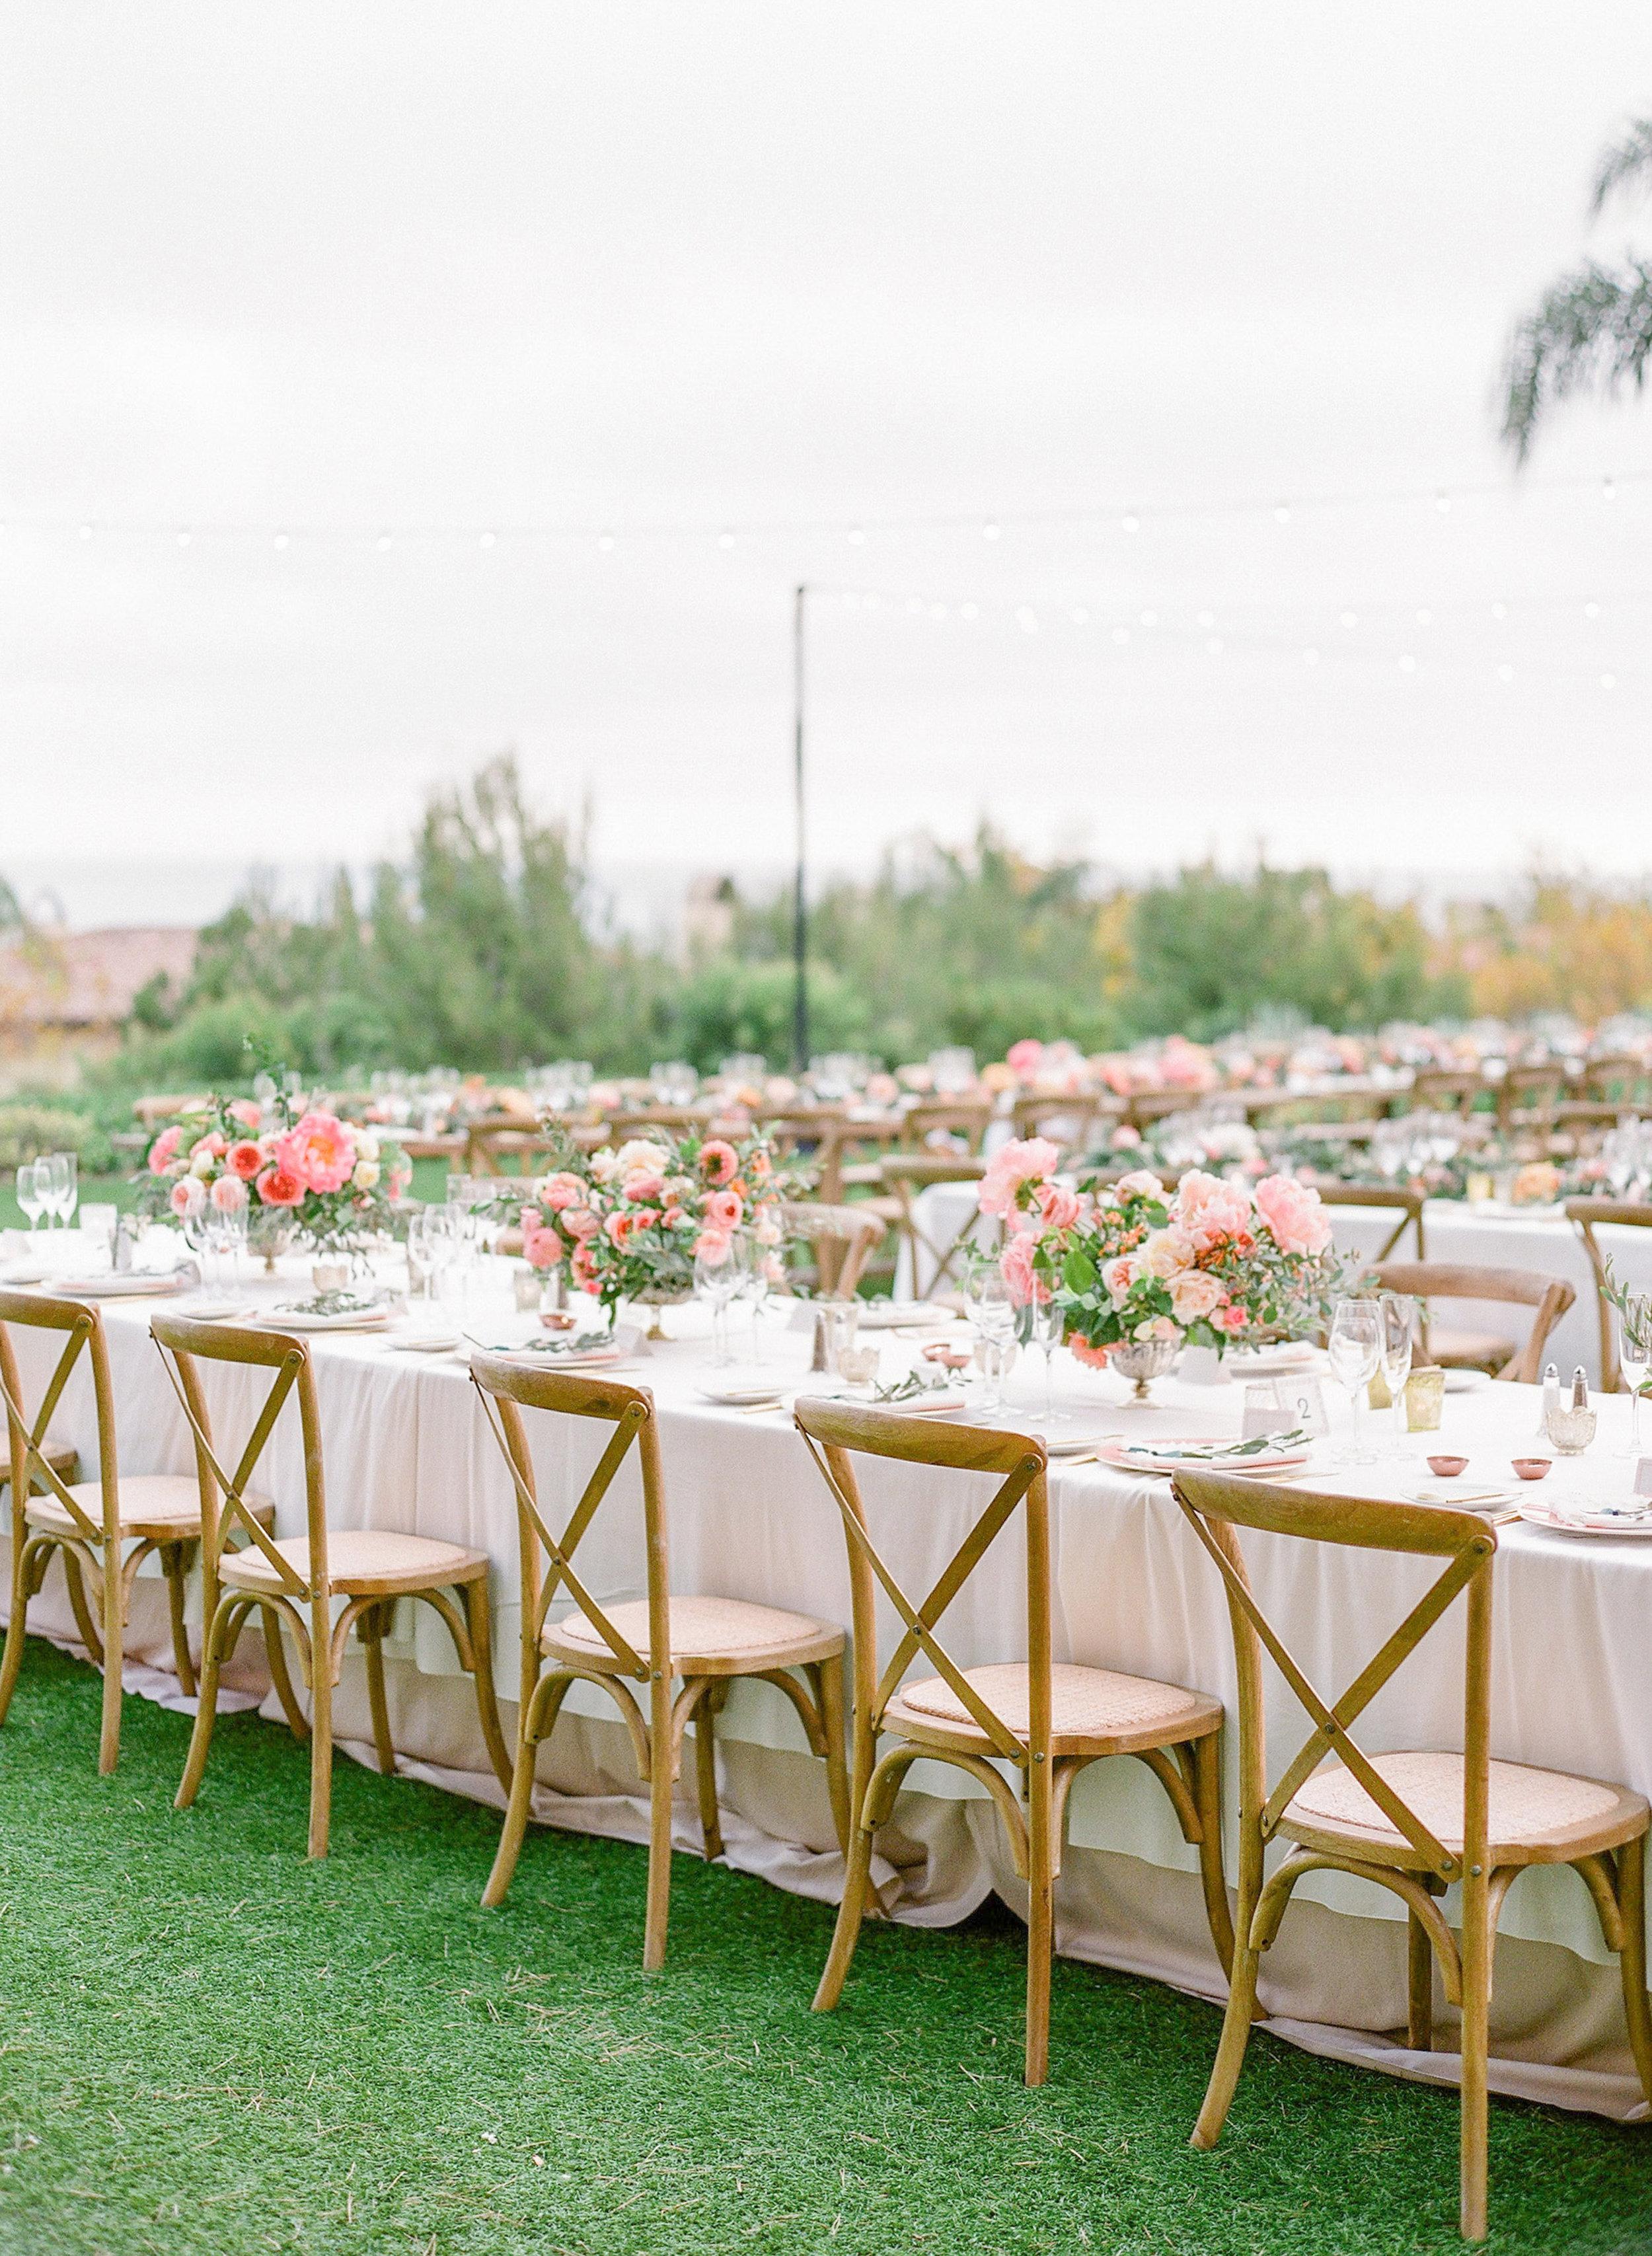 Terranea-Wedding-Palos-Verdes-702.jpg